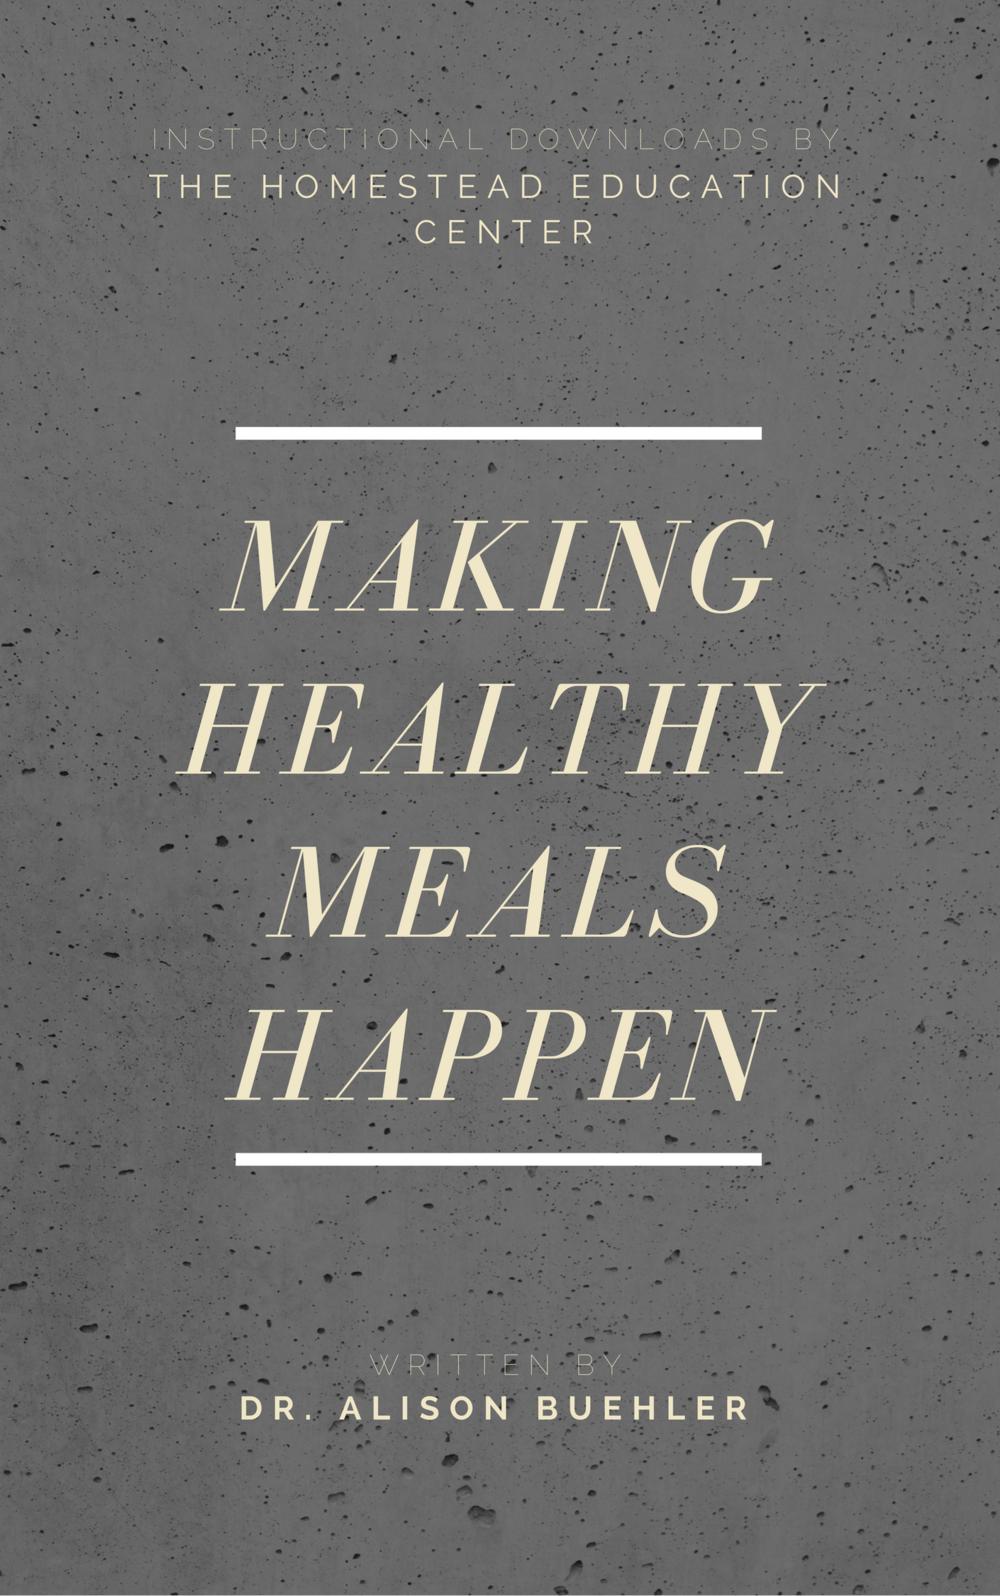 Making Healthy Meals Happen.png